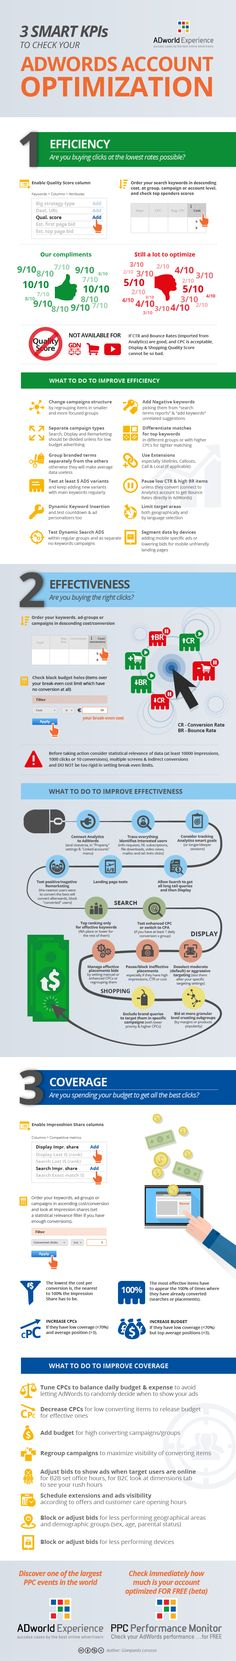 #AdWords optimization measurement Infographic #ppc